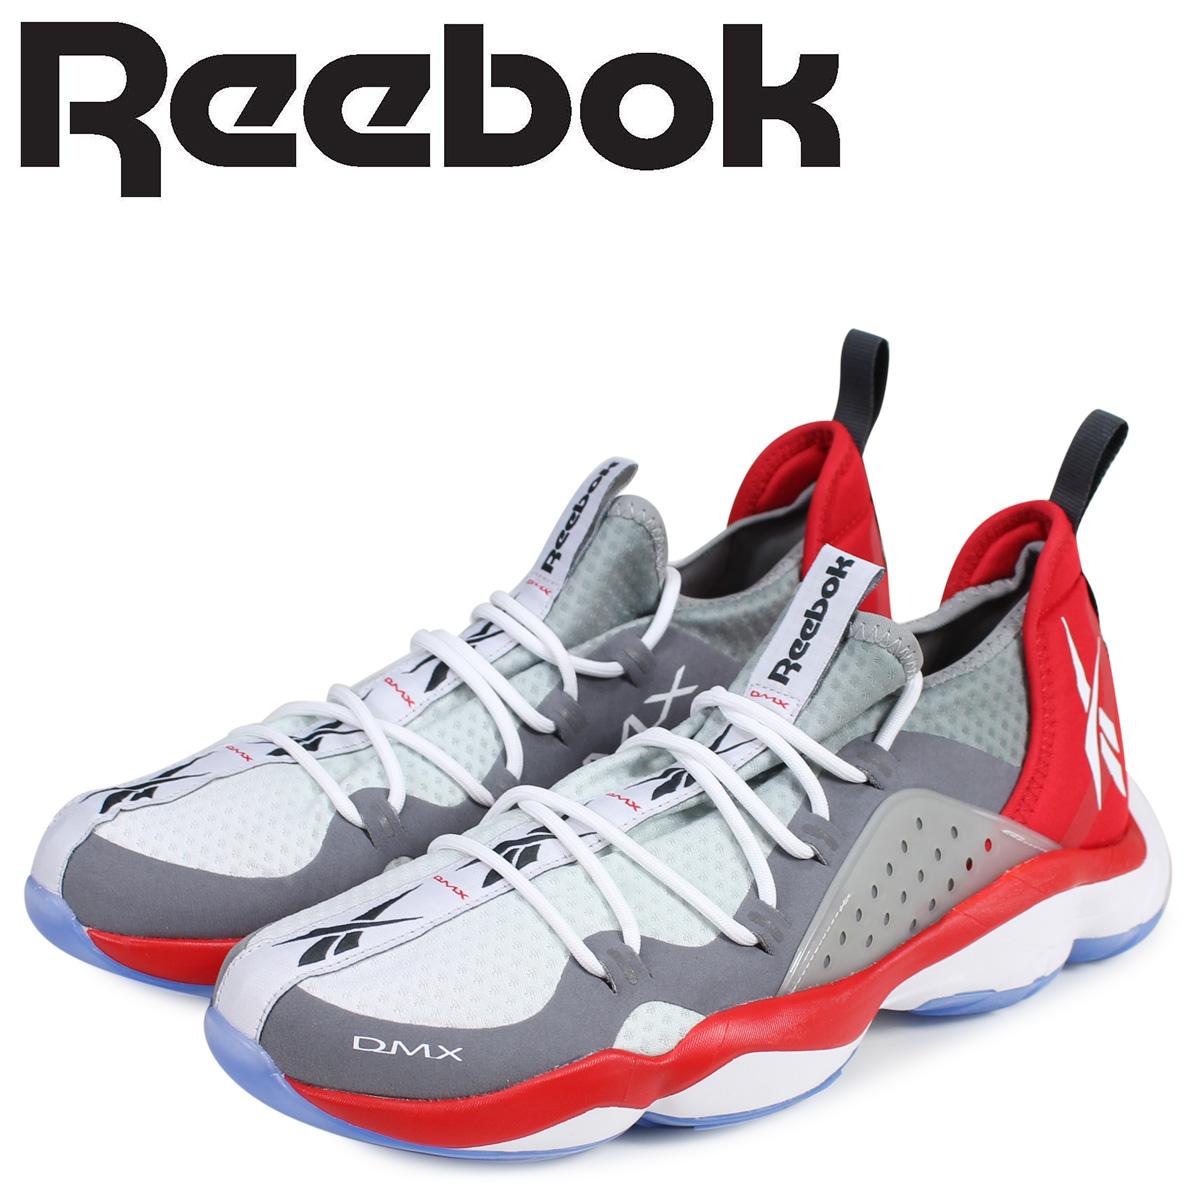 Reebok リーボック ディーエムエックスフュージョン スニーカー メンズ DMX FUSION 2 OG ホワイト 白 CN7710 [4/4 新入荷]